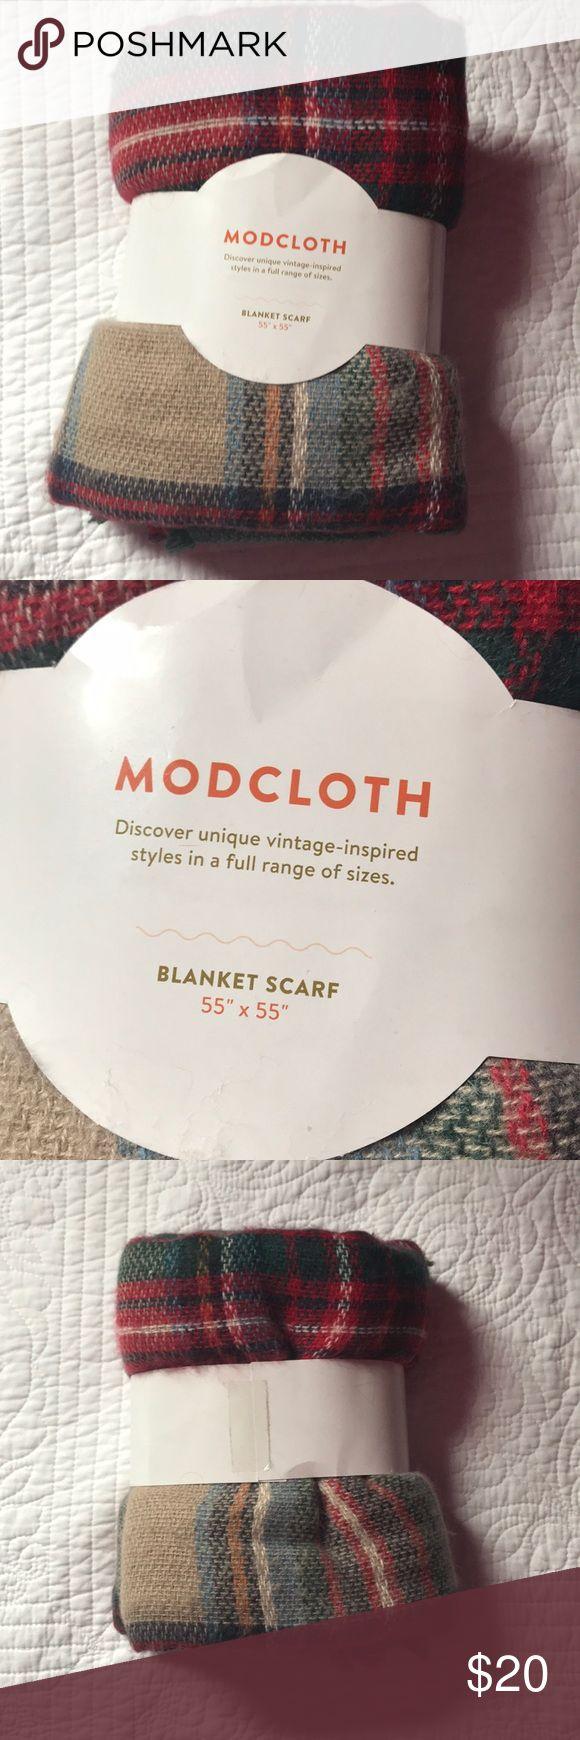 ModCloth blanket scarf. NEW Brand new. ModCloth. Smoke free. Pet friendly Modcloth Accessories Scarves & Wraps